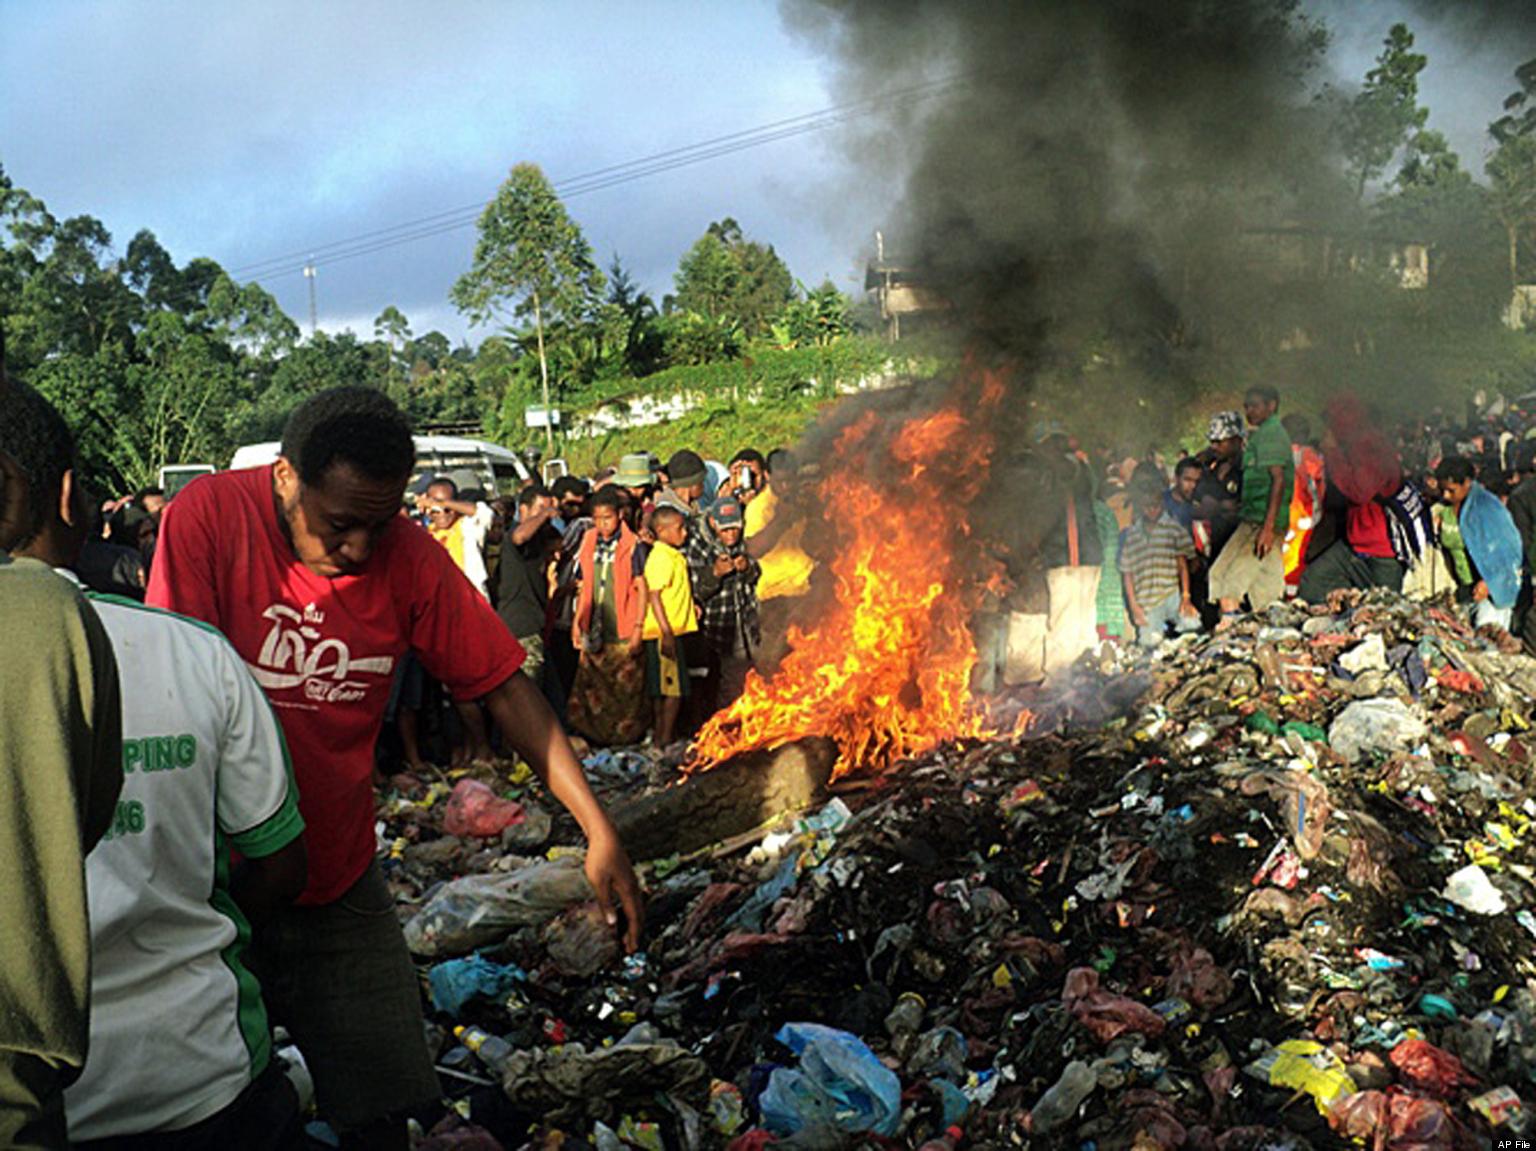 http://i.huffpost.com/gen/1075461/images/o-PAPUA-NEW-GUINEA-SORCERY-MURDER-facebook.jpg Being Burned Alive